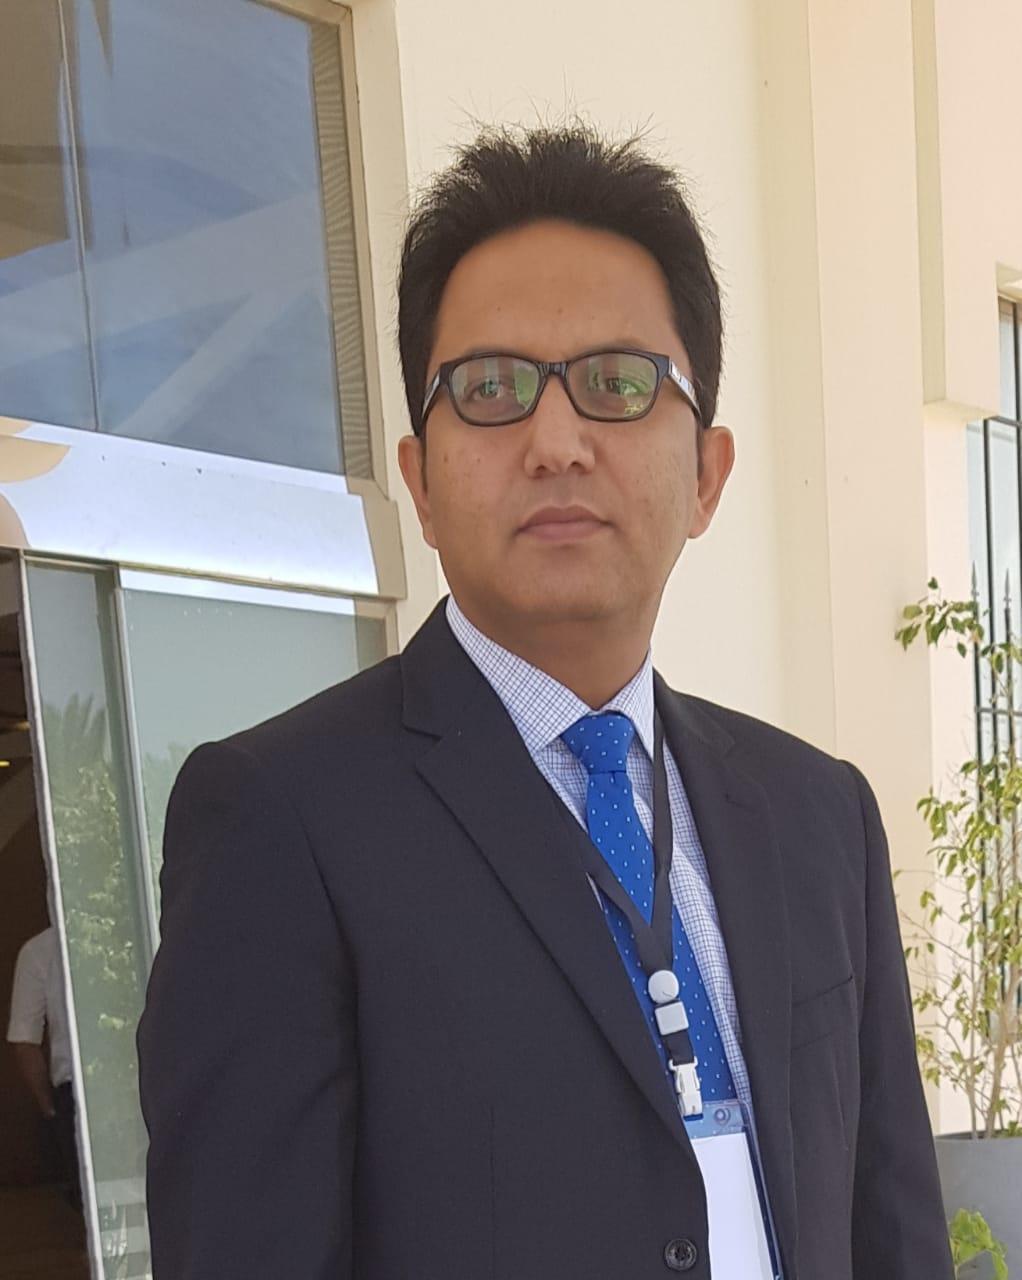 Dr. Inayat Ullah